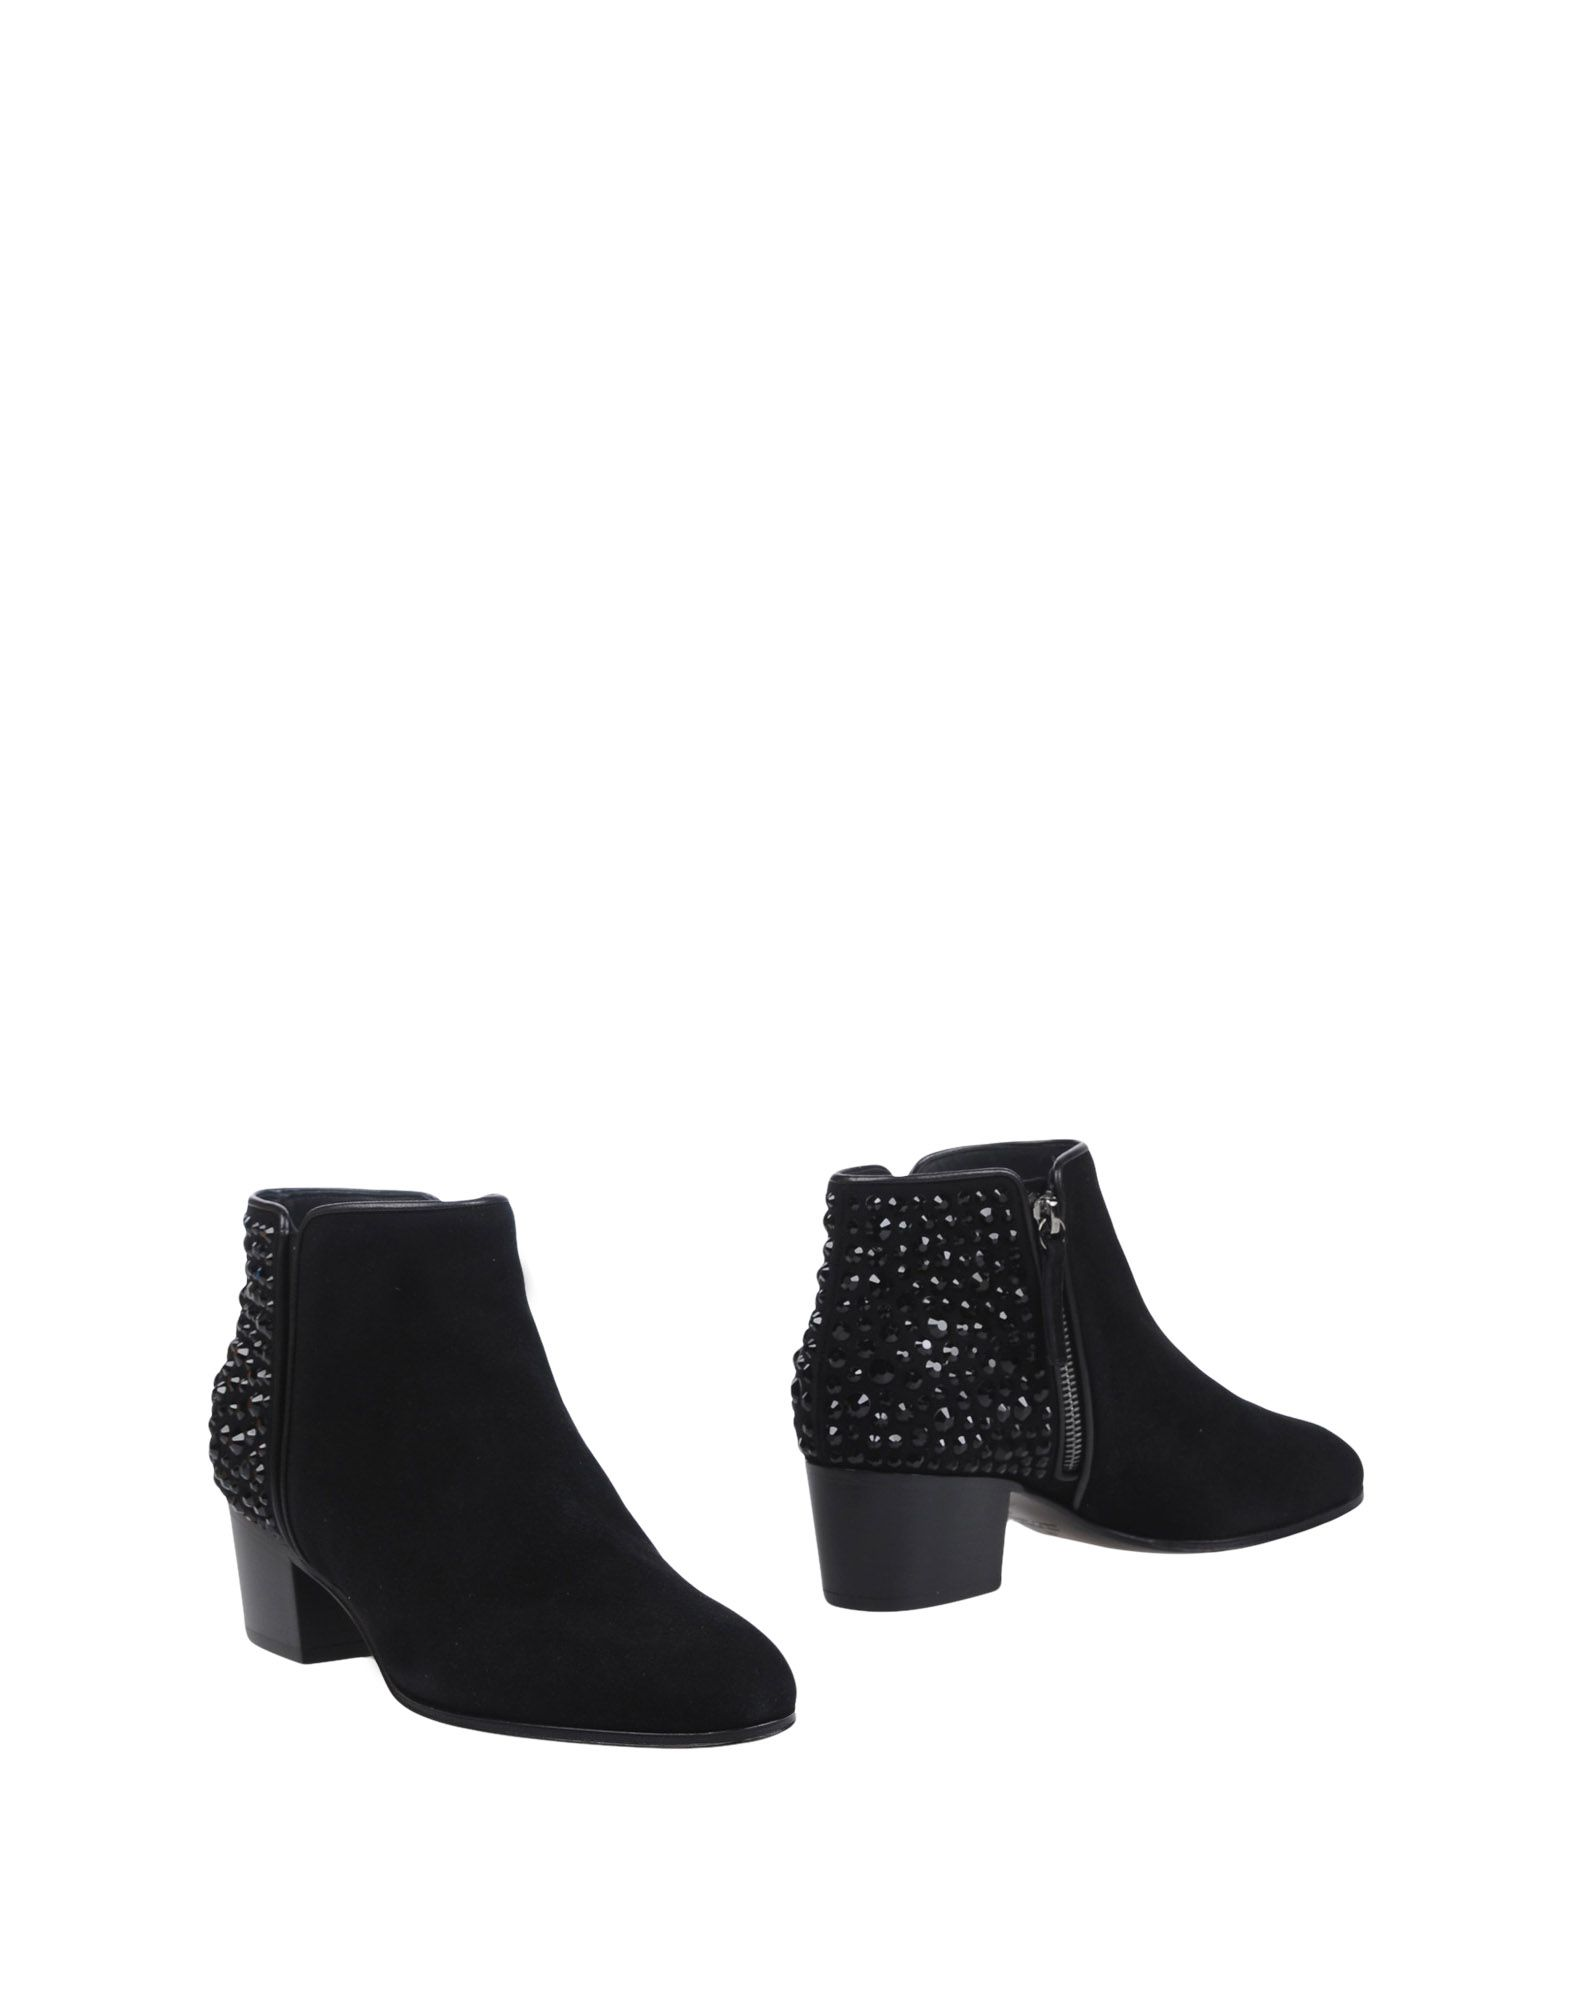 Giuseppe Zanotti Stiefelette Damen Schuhe  11208563PNGünstige gut aussehende Schuhe Damen 139a30